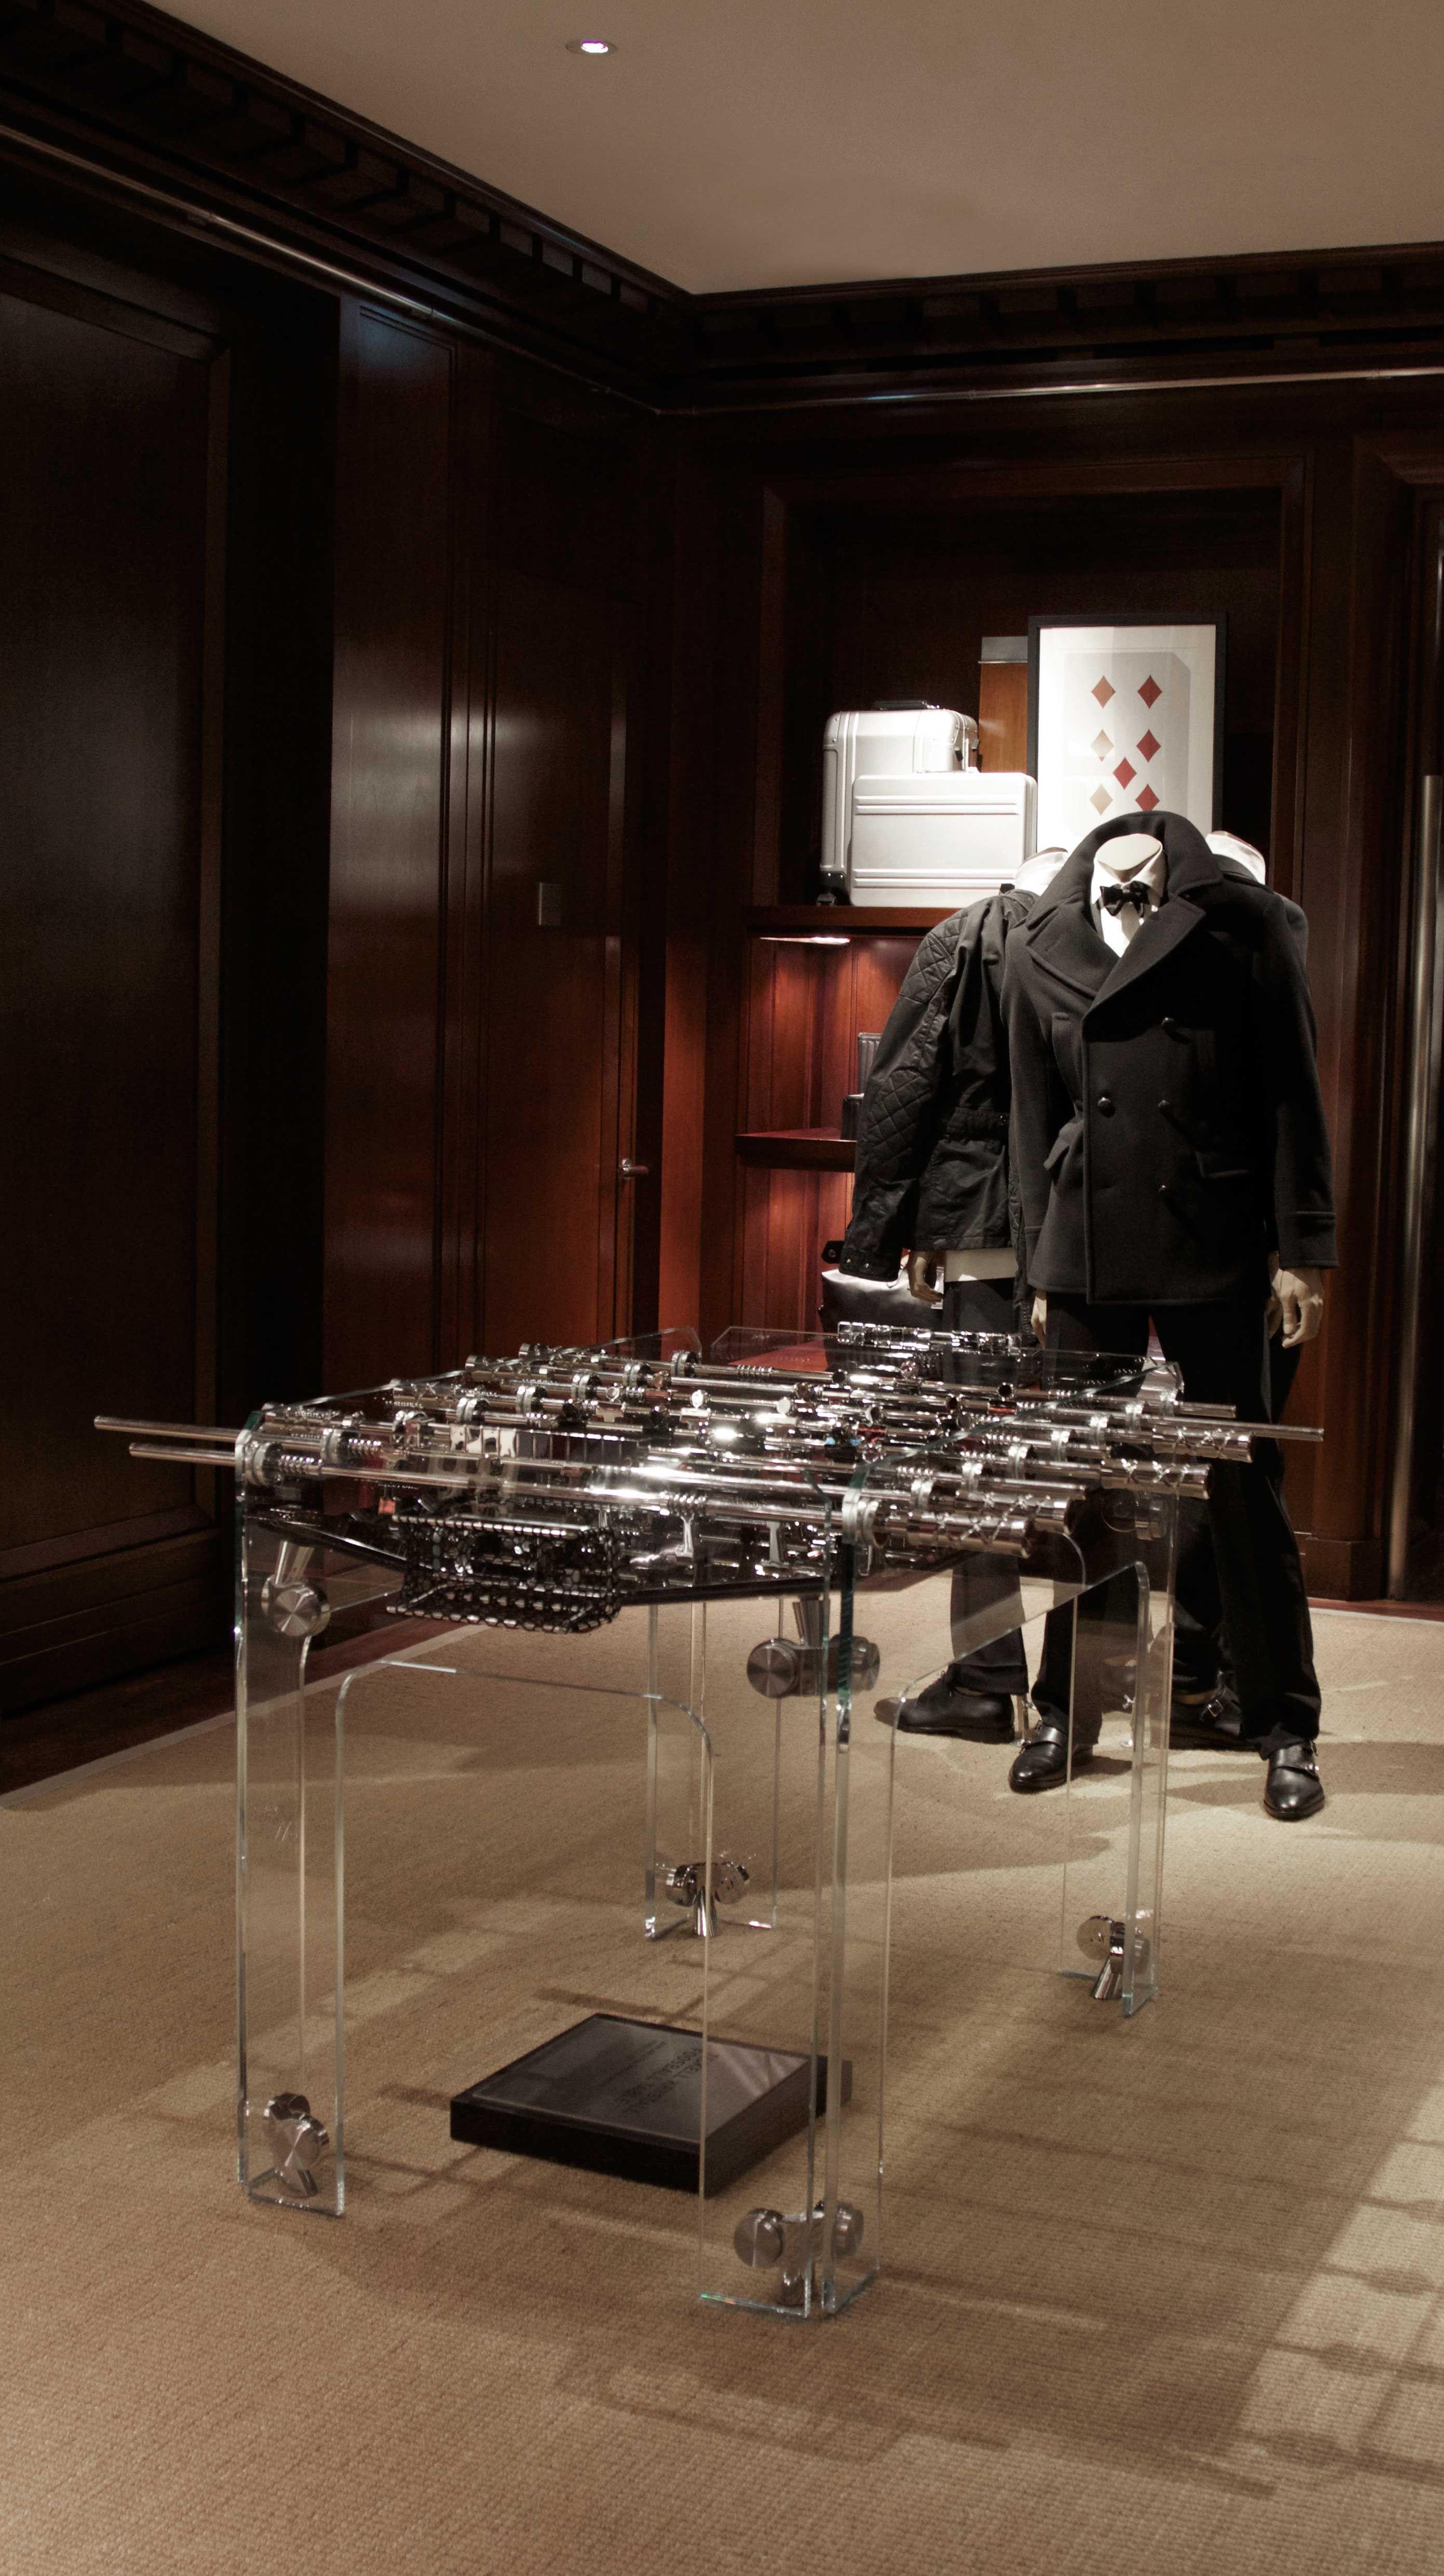 Teckell with Retailers Ralph Lauren  #teckell #calciobalilla #cristallino #trasparent #ralphlauren #london